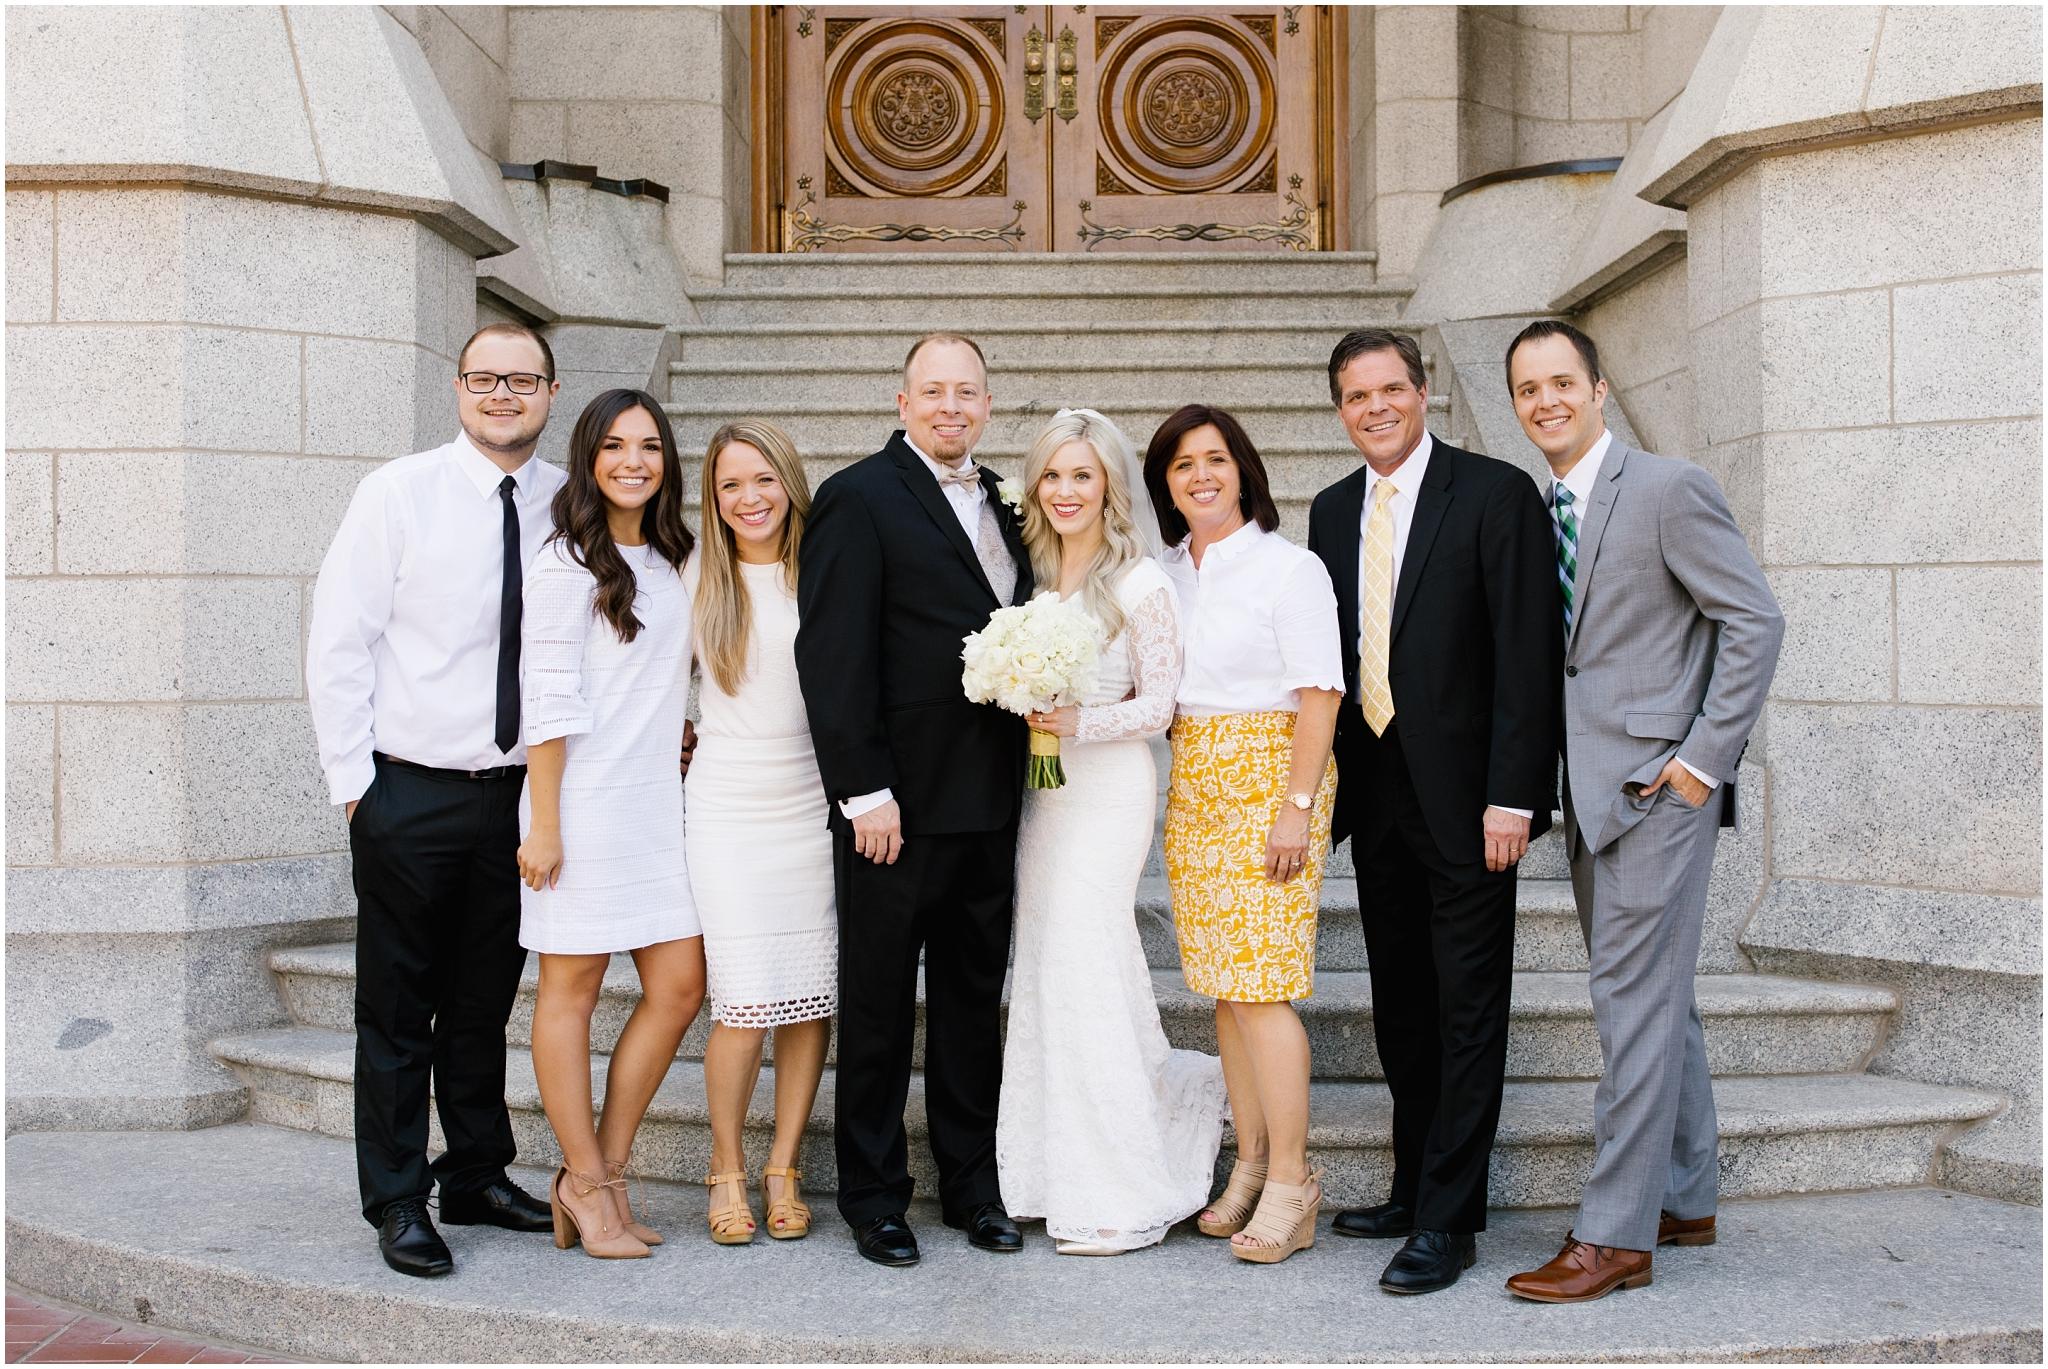 CherylandTyler-79_Lizzie-B-Imagery-Utah-Wedding-Photographer-Salt-Lake-City-Temple-Wells-Fargo-Building-Reception.jpg